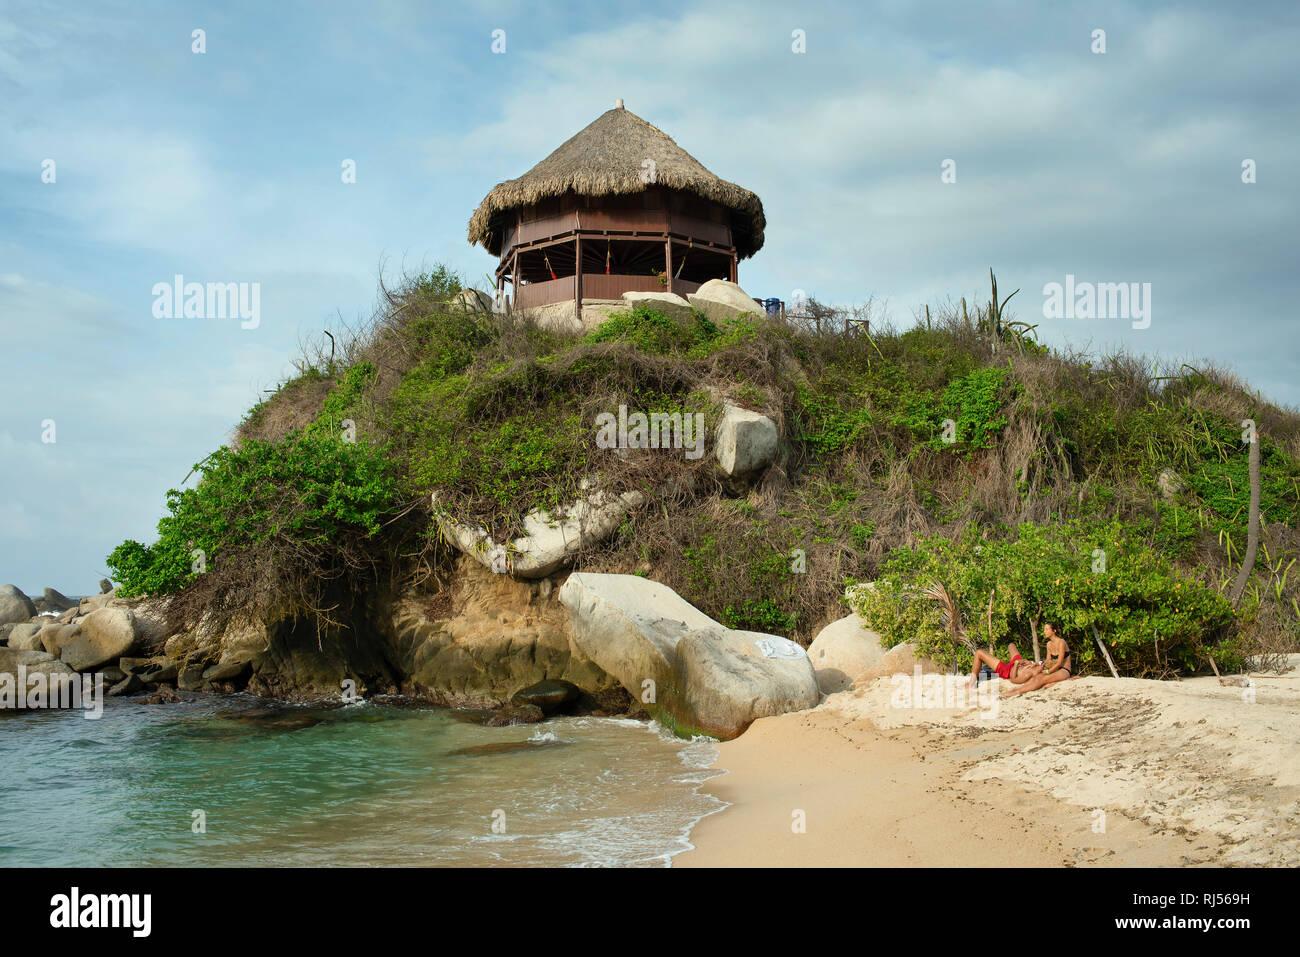 Cabana at the mirador of Cabo San Juan with a couple enjoying the beach. Tayrona National Park, Colombia. Sep 2018 - Stock Image